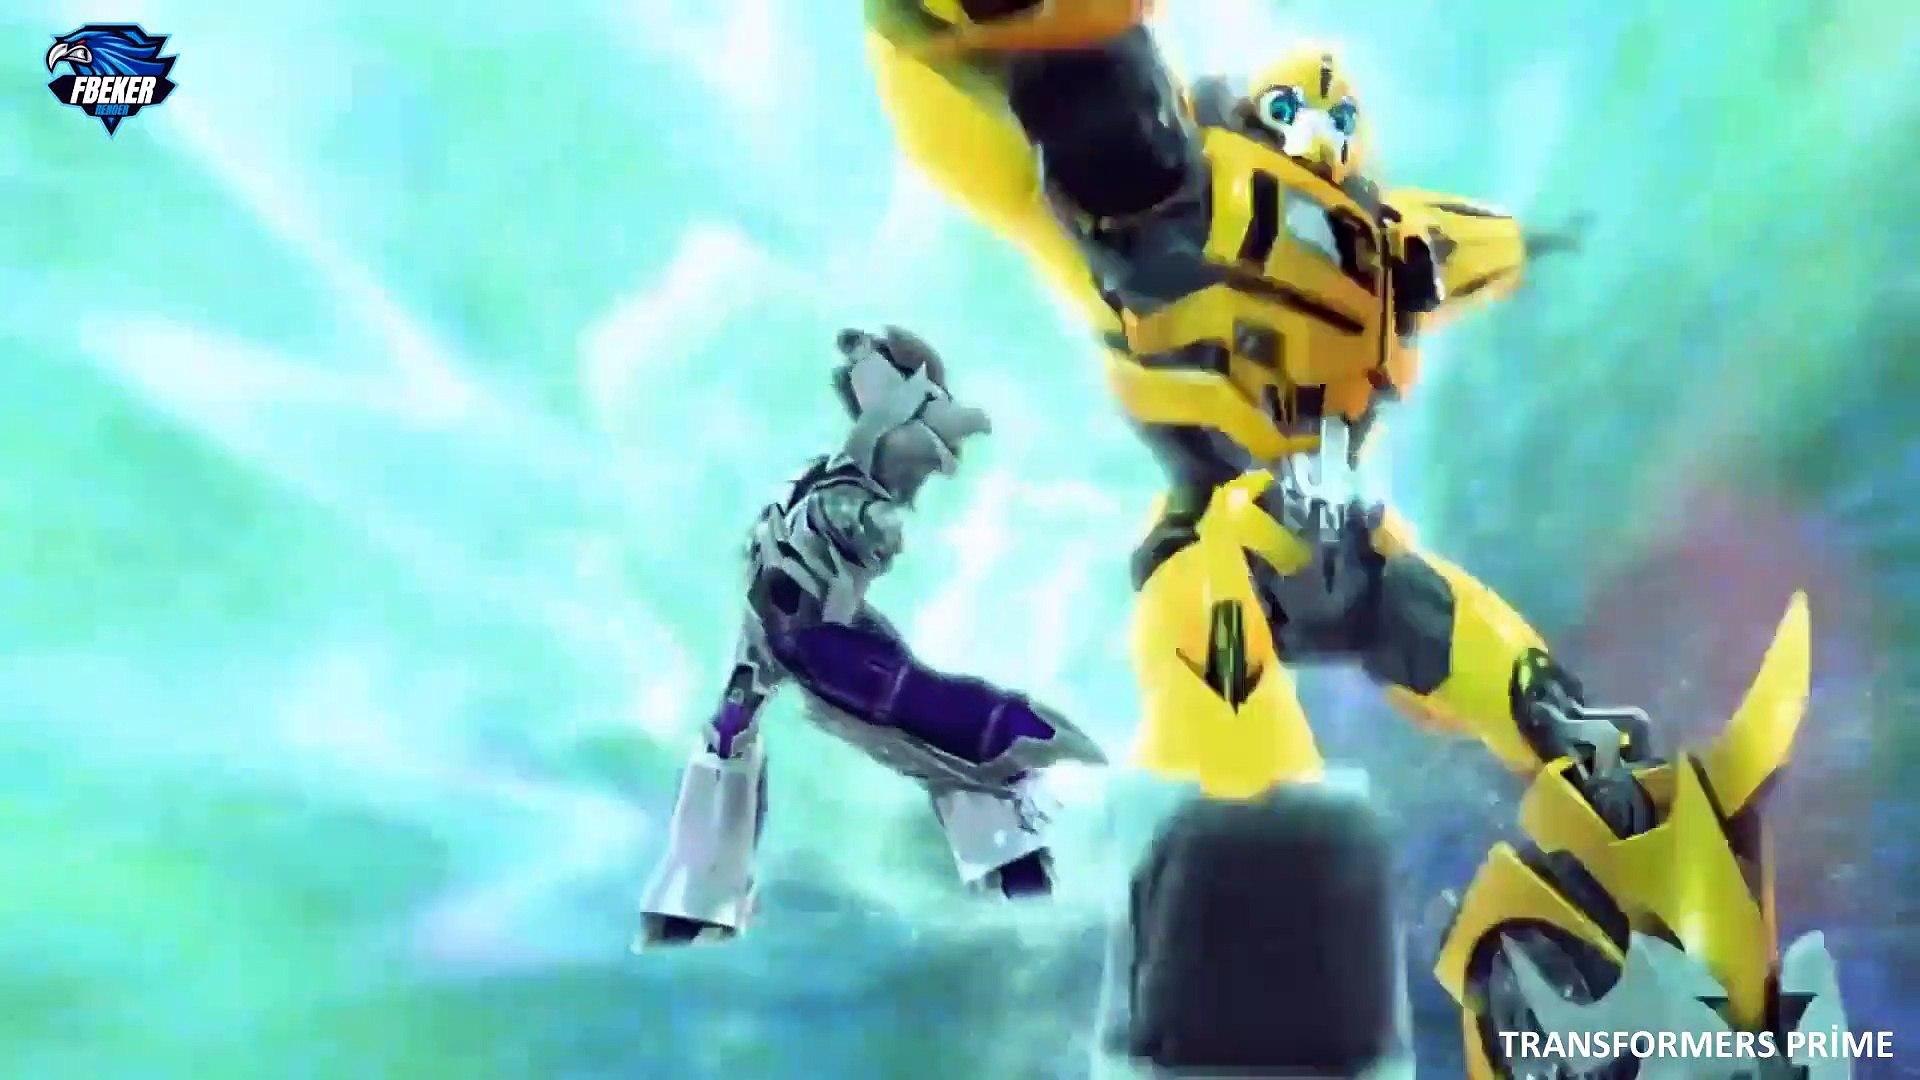 Transformers Prime 30.Bölüm Operasyon Bumblebee Kısım 1 Full Hd